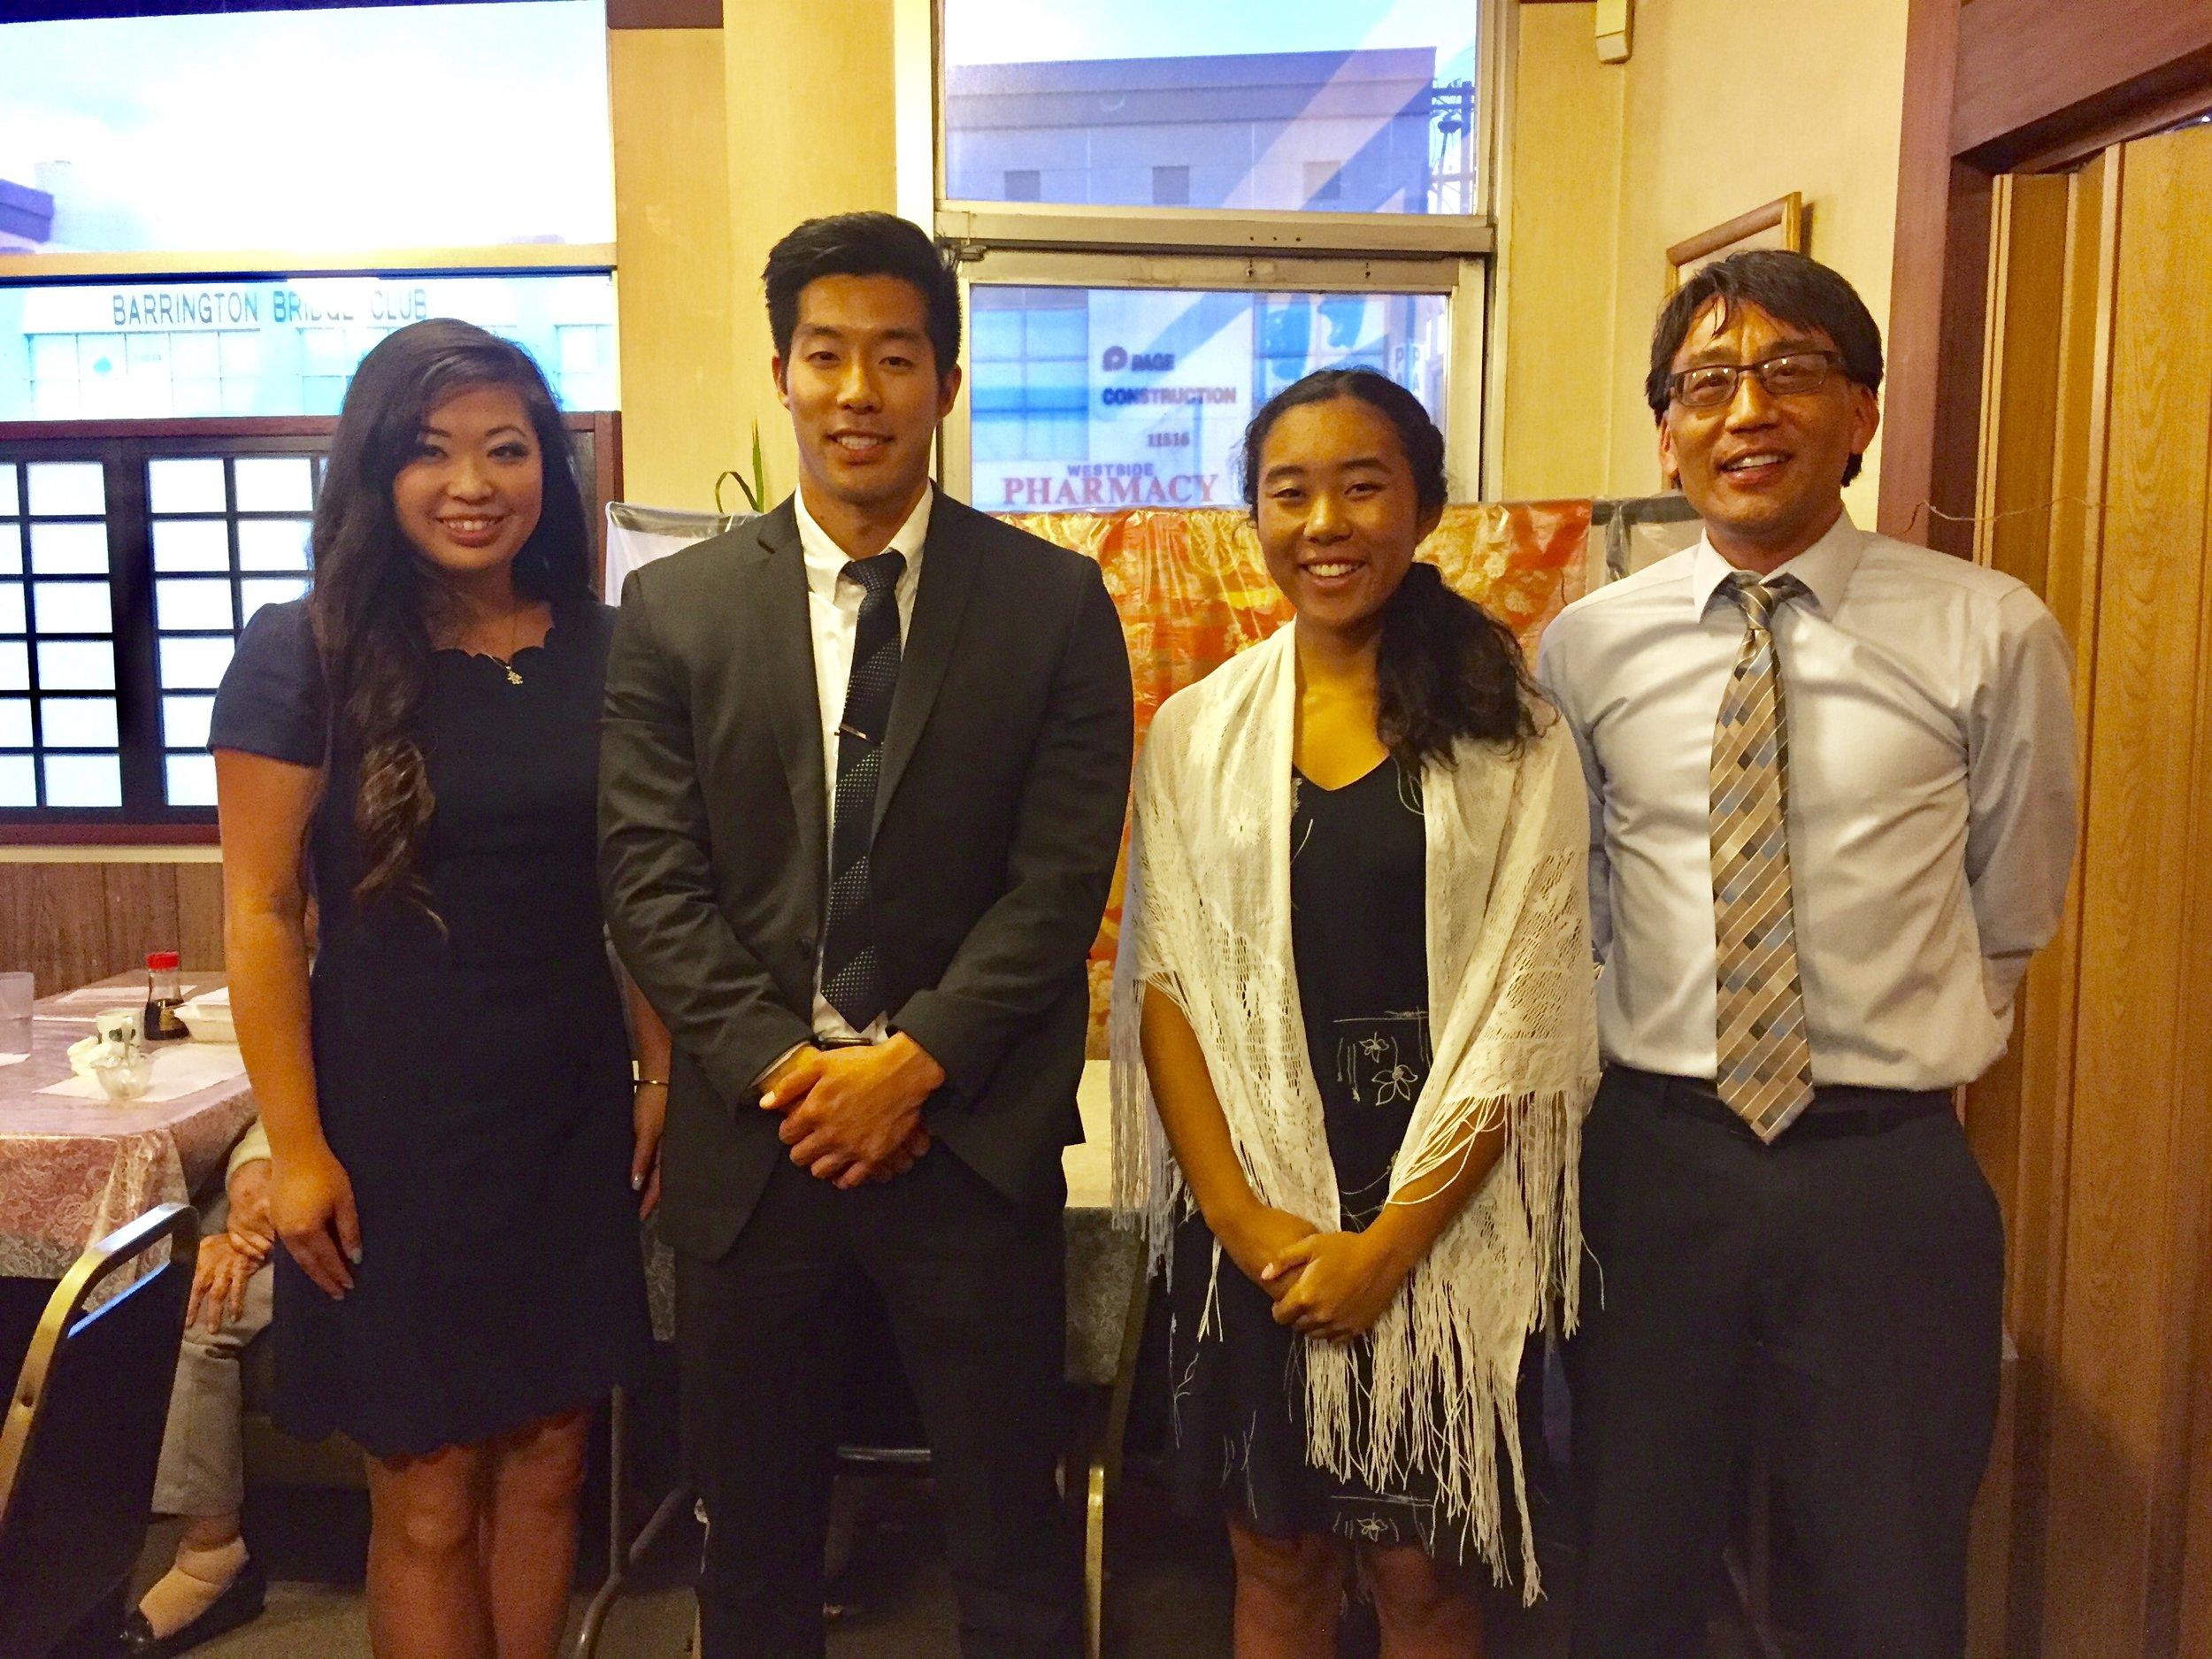 (Left to Right) Shannon Tsumaki, Masumi Asahi, Mariko Brooks, John Saito Jr.